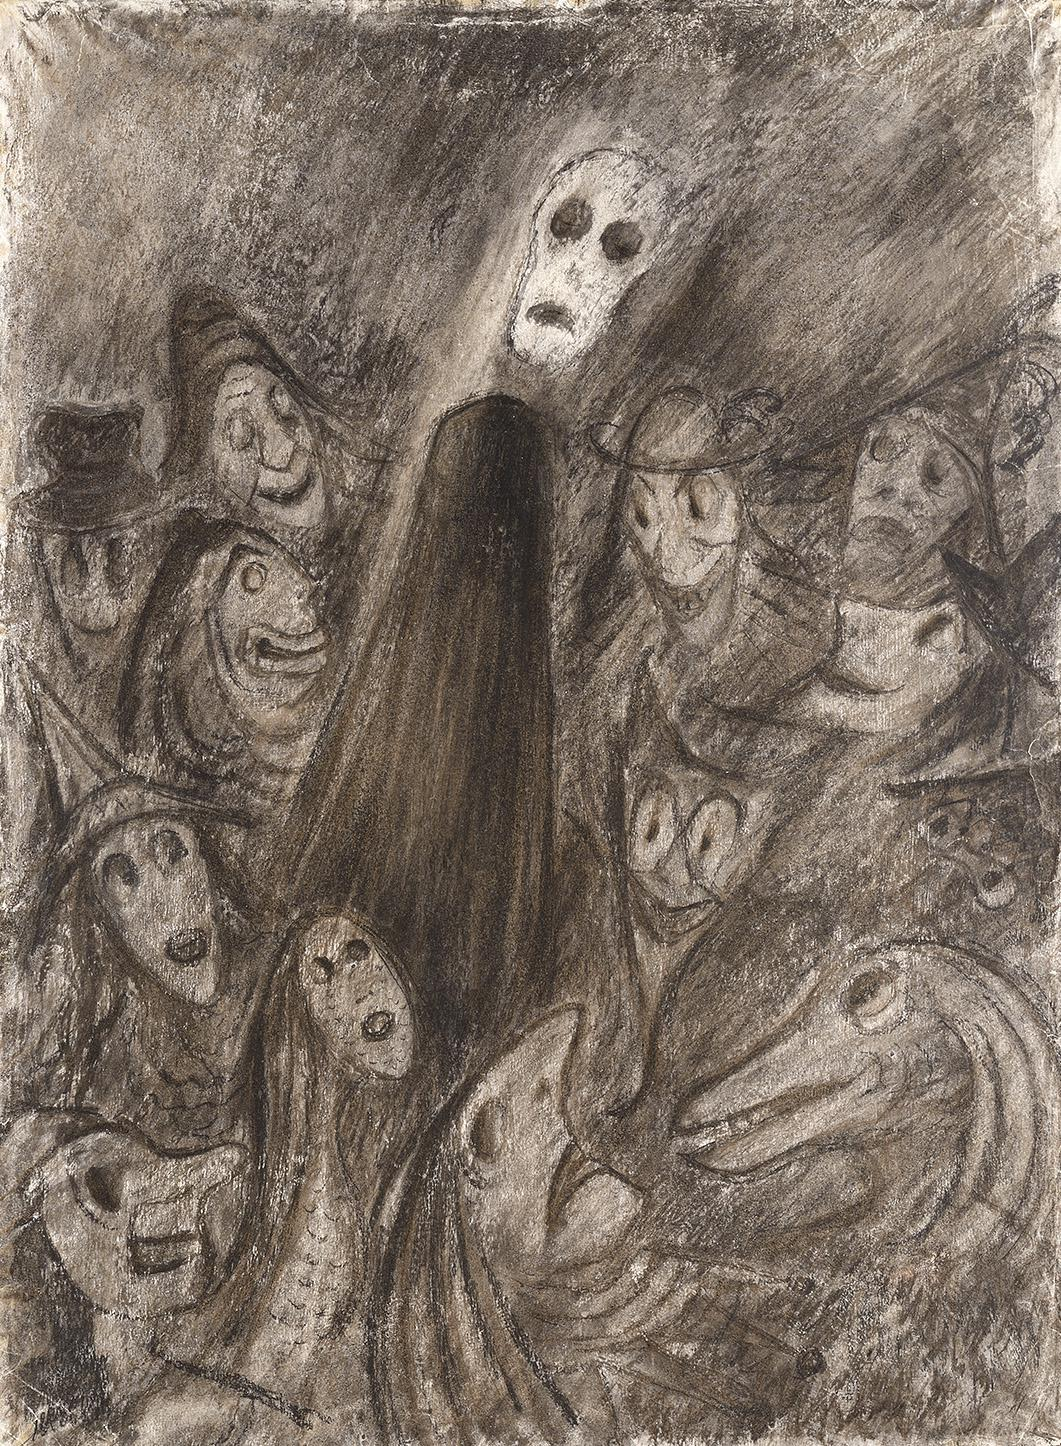 Alén Diviš / Maska rudé smrti (Poe), 1950